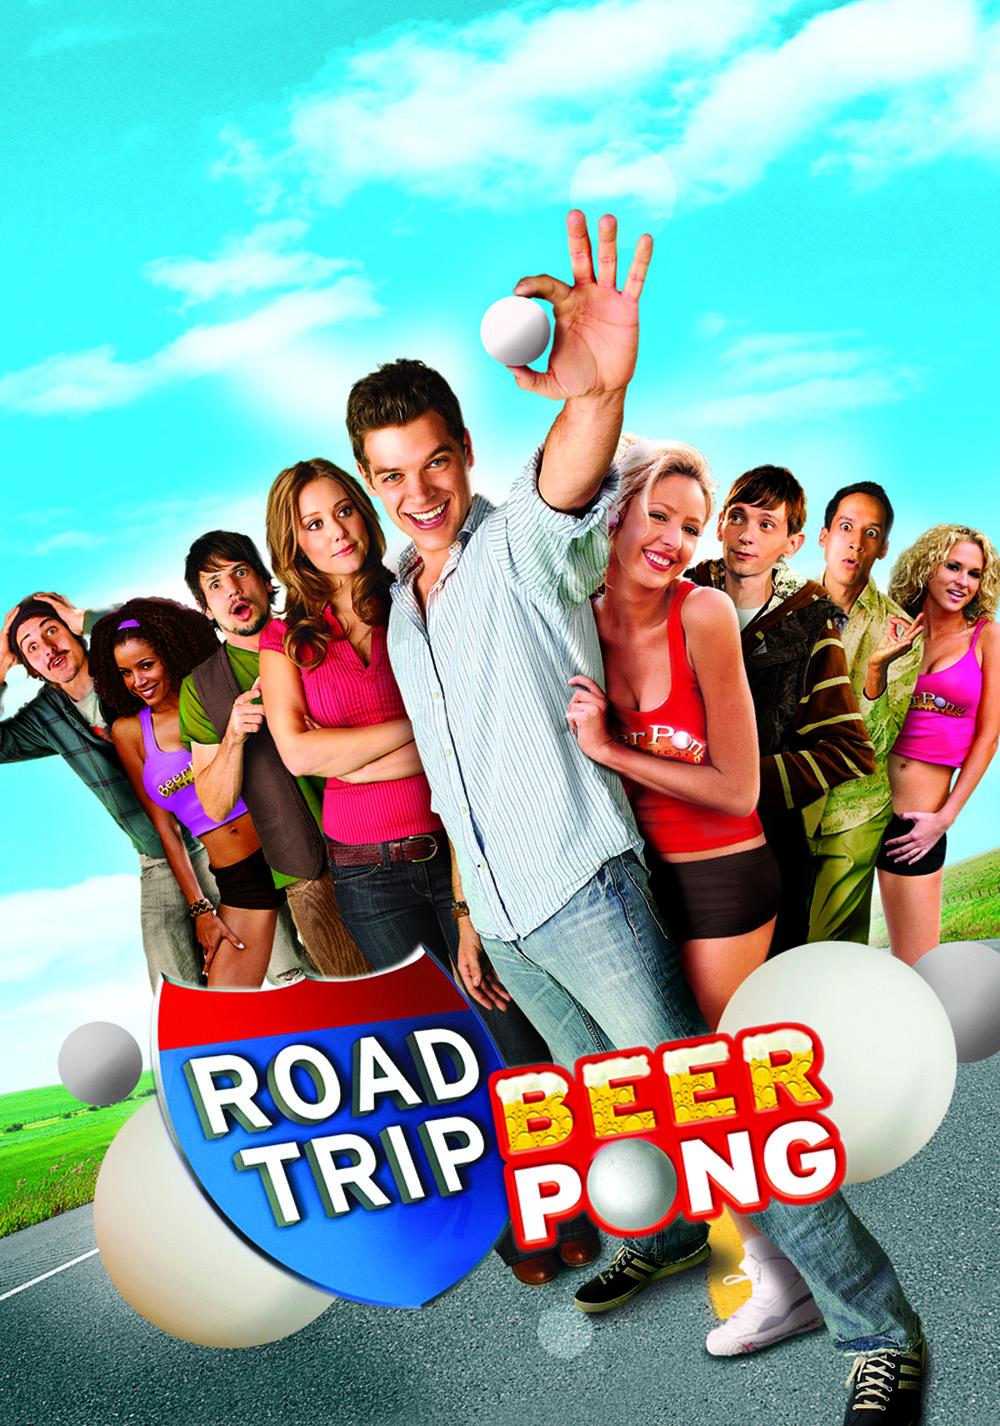 Road Trip – Bier Pong